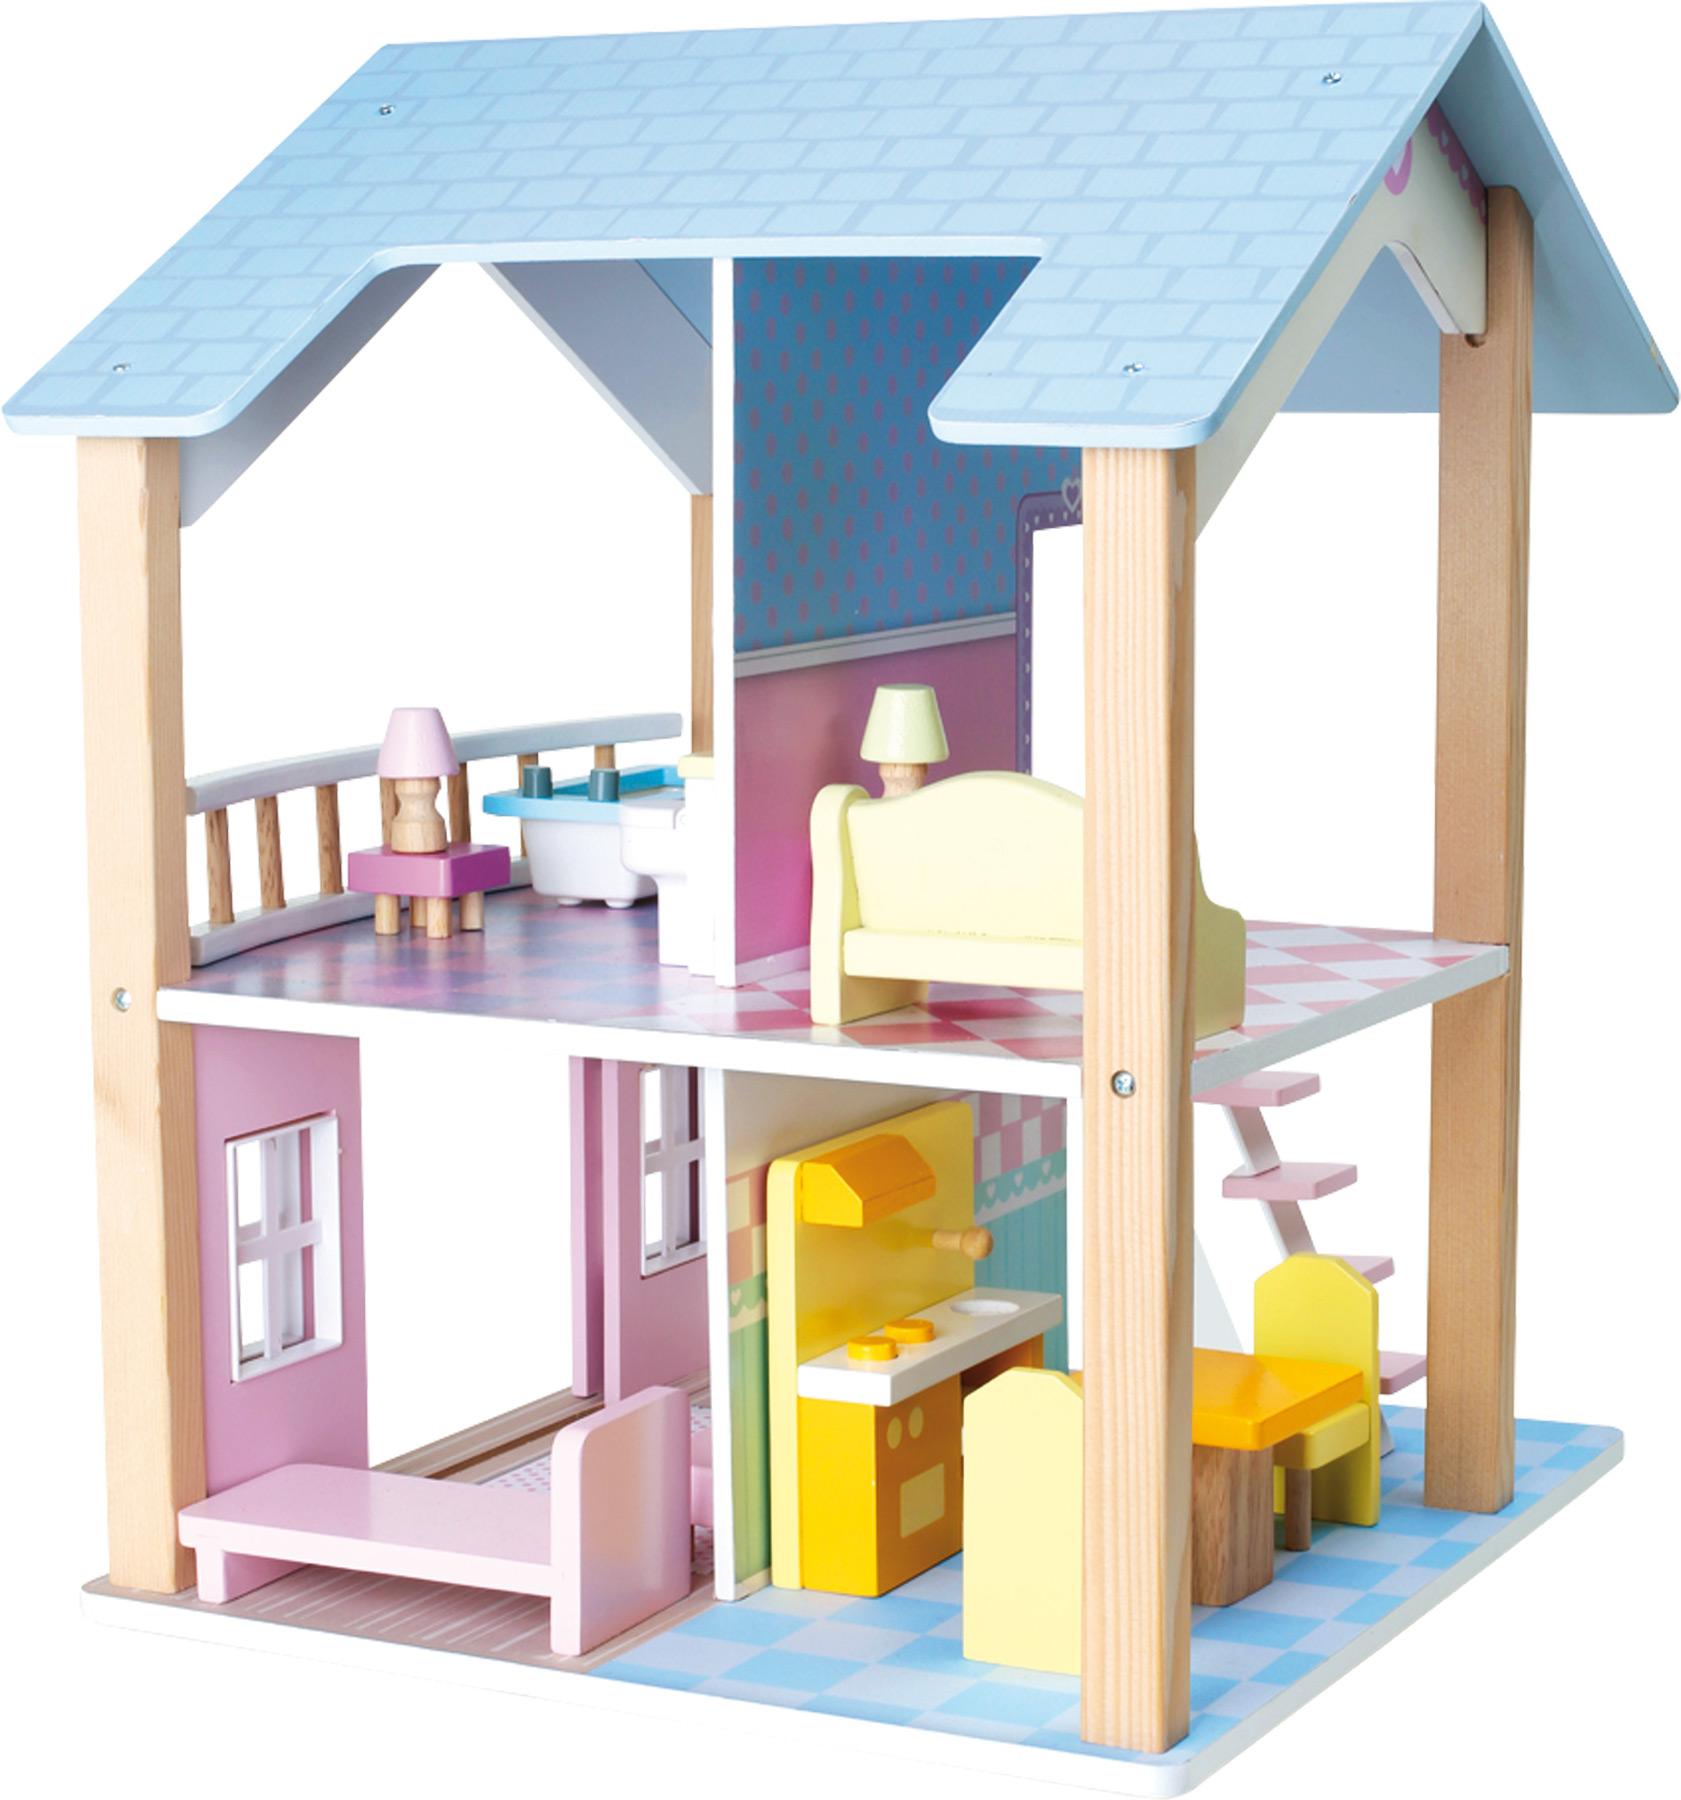 puppenhaus 2 etagen drehbar 15 m belst cke holz ab 3 jahre ca 42 x 39 x 50cm neu ebay. Black Bedroom Furniture Sets. Home Design Ideas